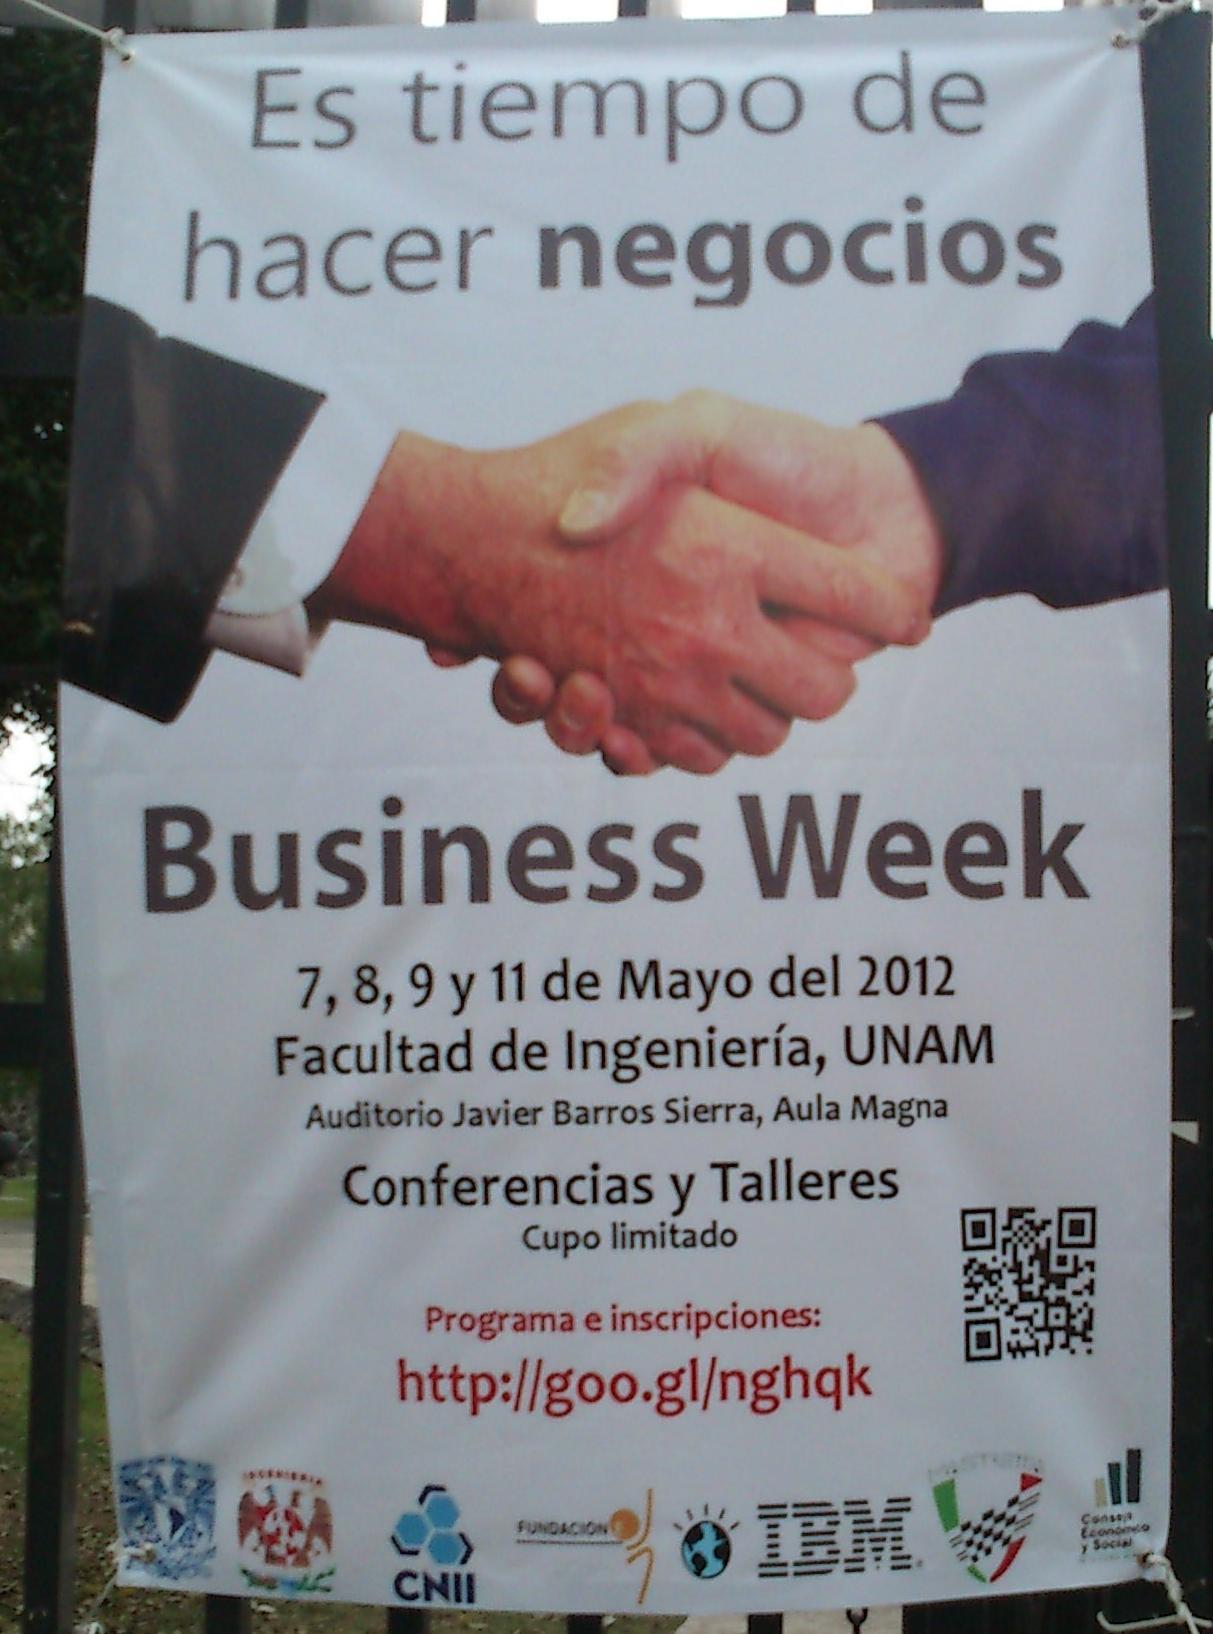 Reseña de la Business Week 2012